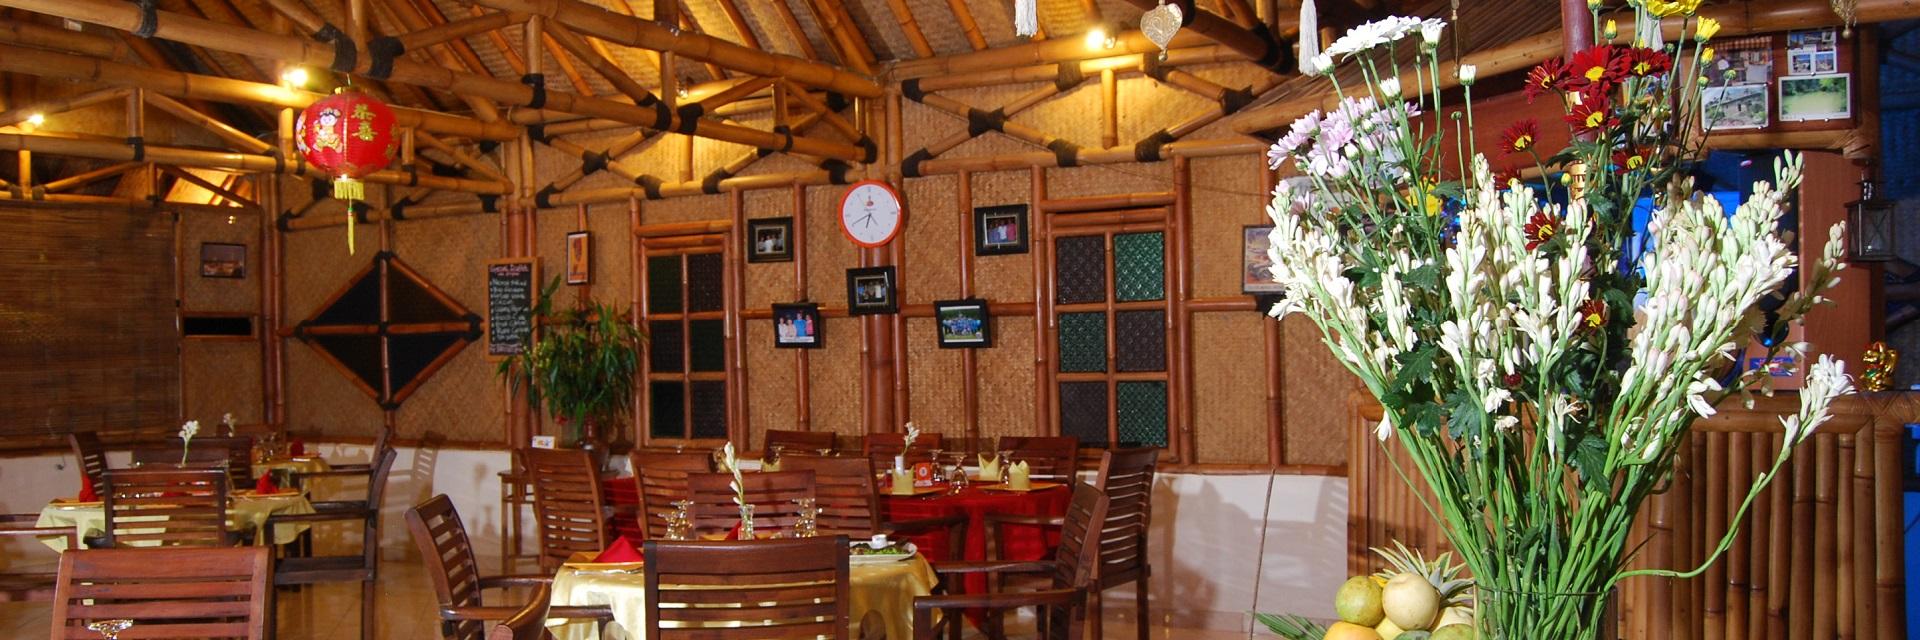 Kafe Unik di Jogja, Yogyakarta, Kota Yogyakarta, Dolan Dolen, Dolaners Kafe Unik di Jogja via Isti - Dolan Dolen